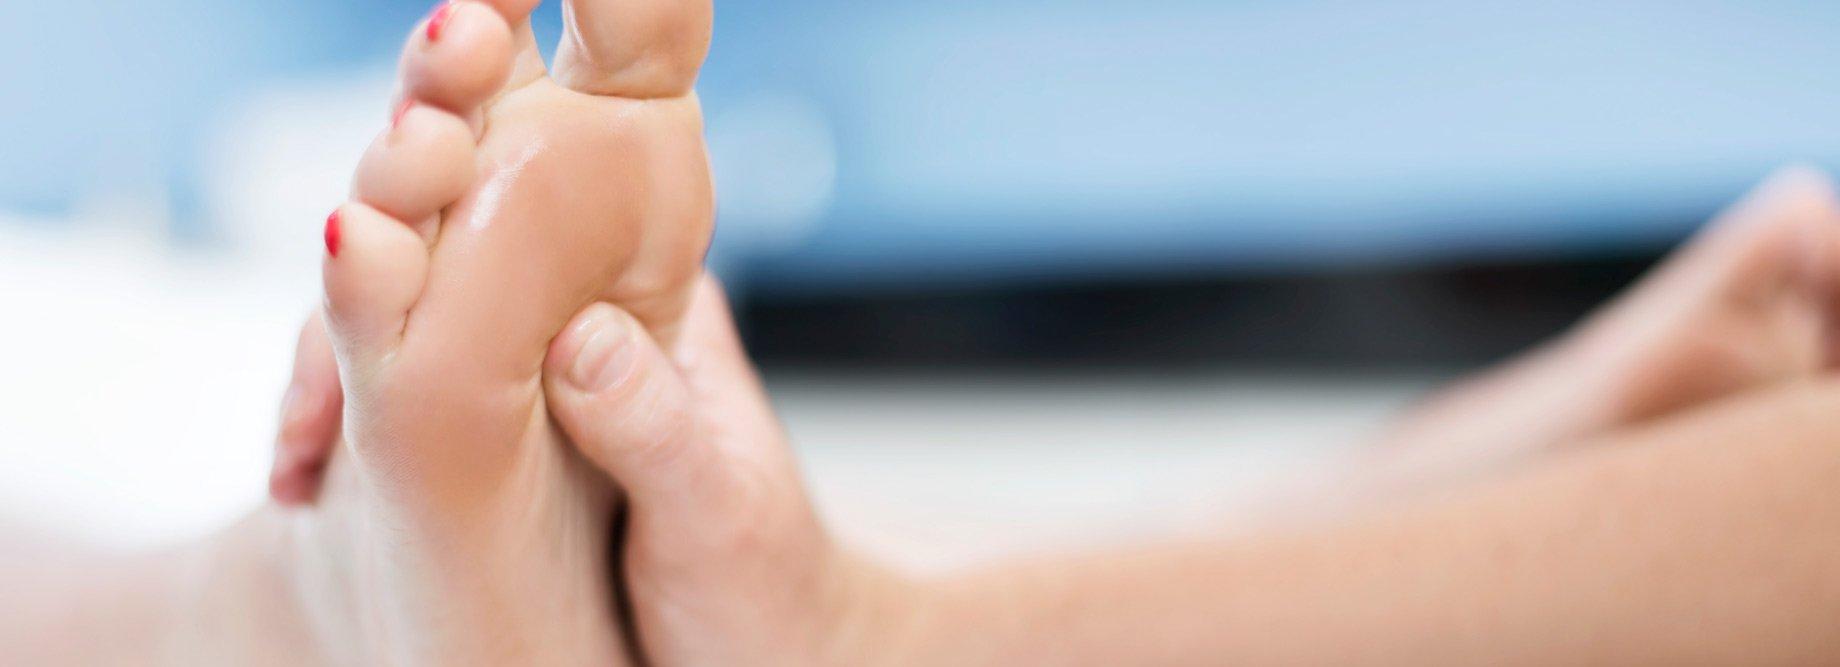 Reflexology In London Foot And Facial Reflexology Triyoga